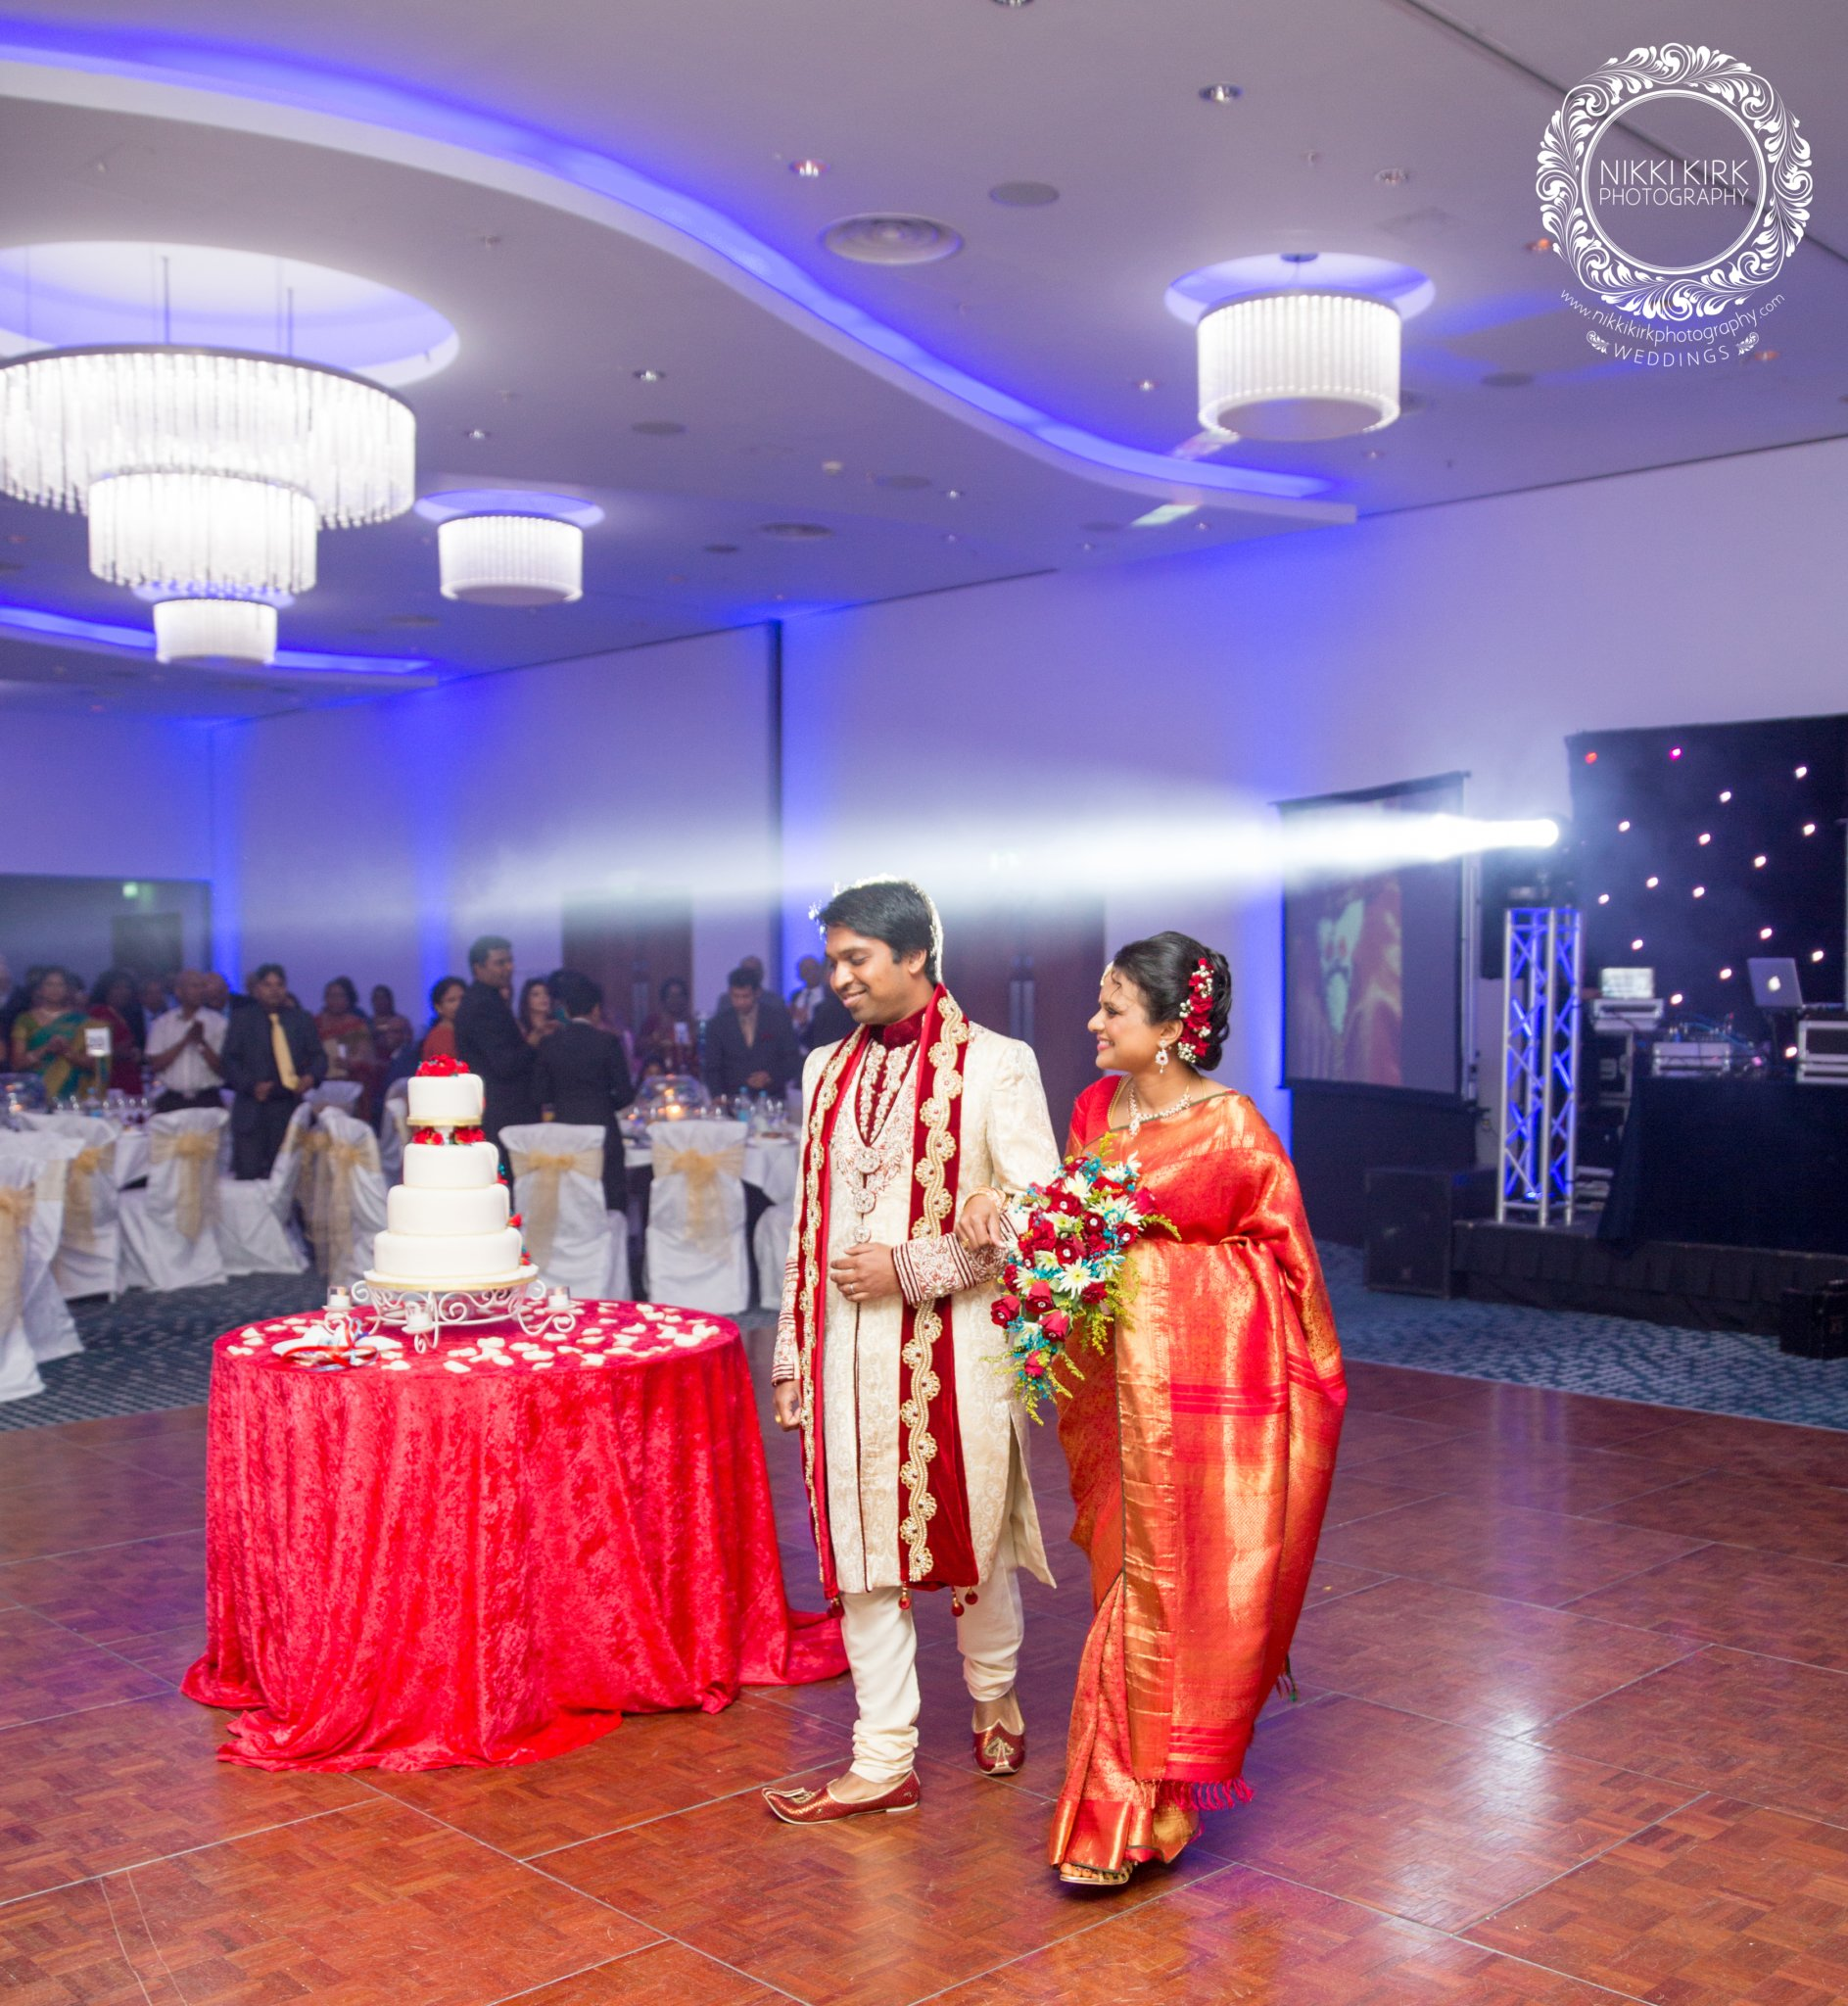 Nikki-Kirk-Photography-Indian-Wedding-Photographer-London-UK-destination